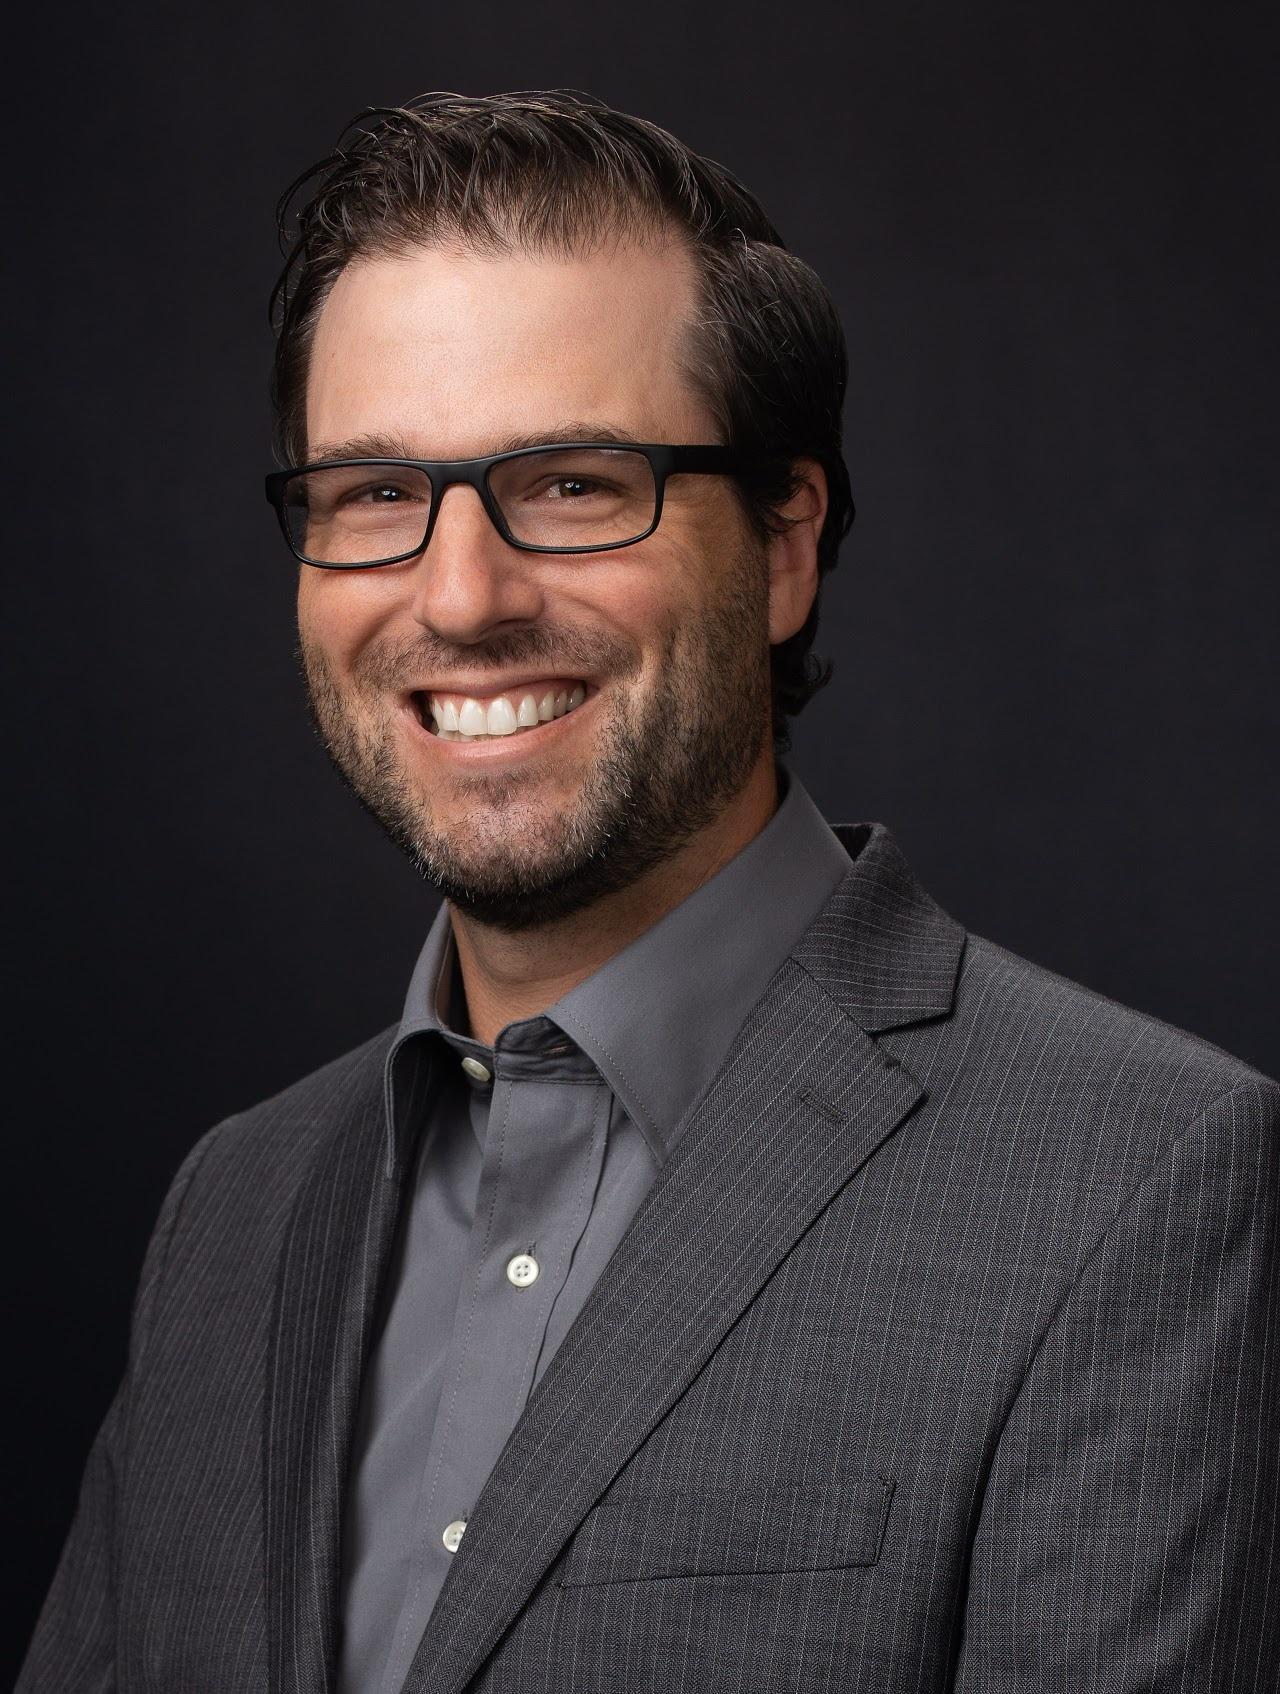 Michael Hirtzel